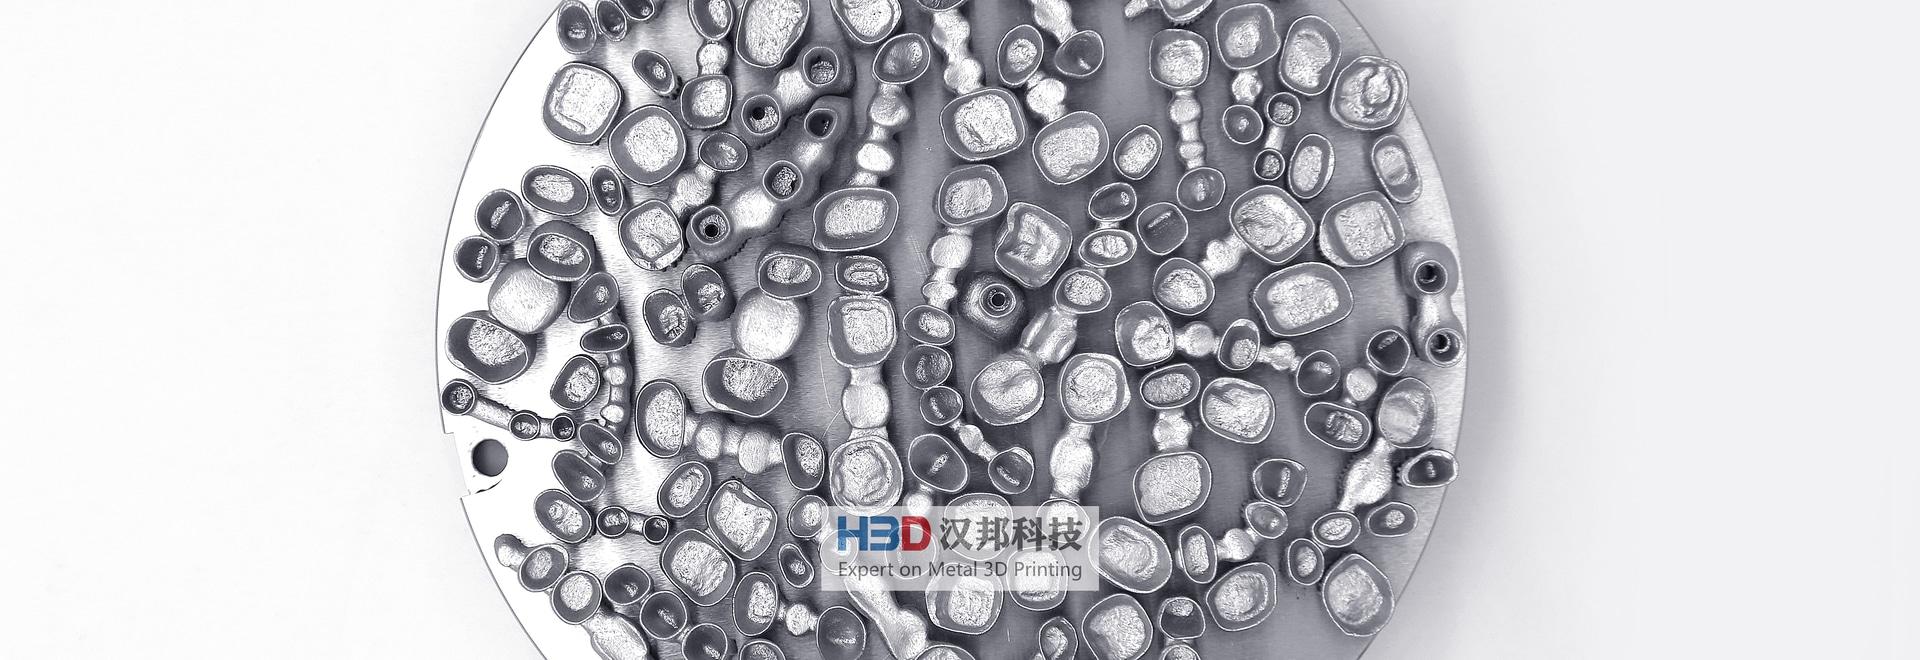 HBD Metal 3D Printing in Dental Application